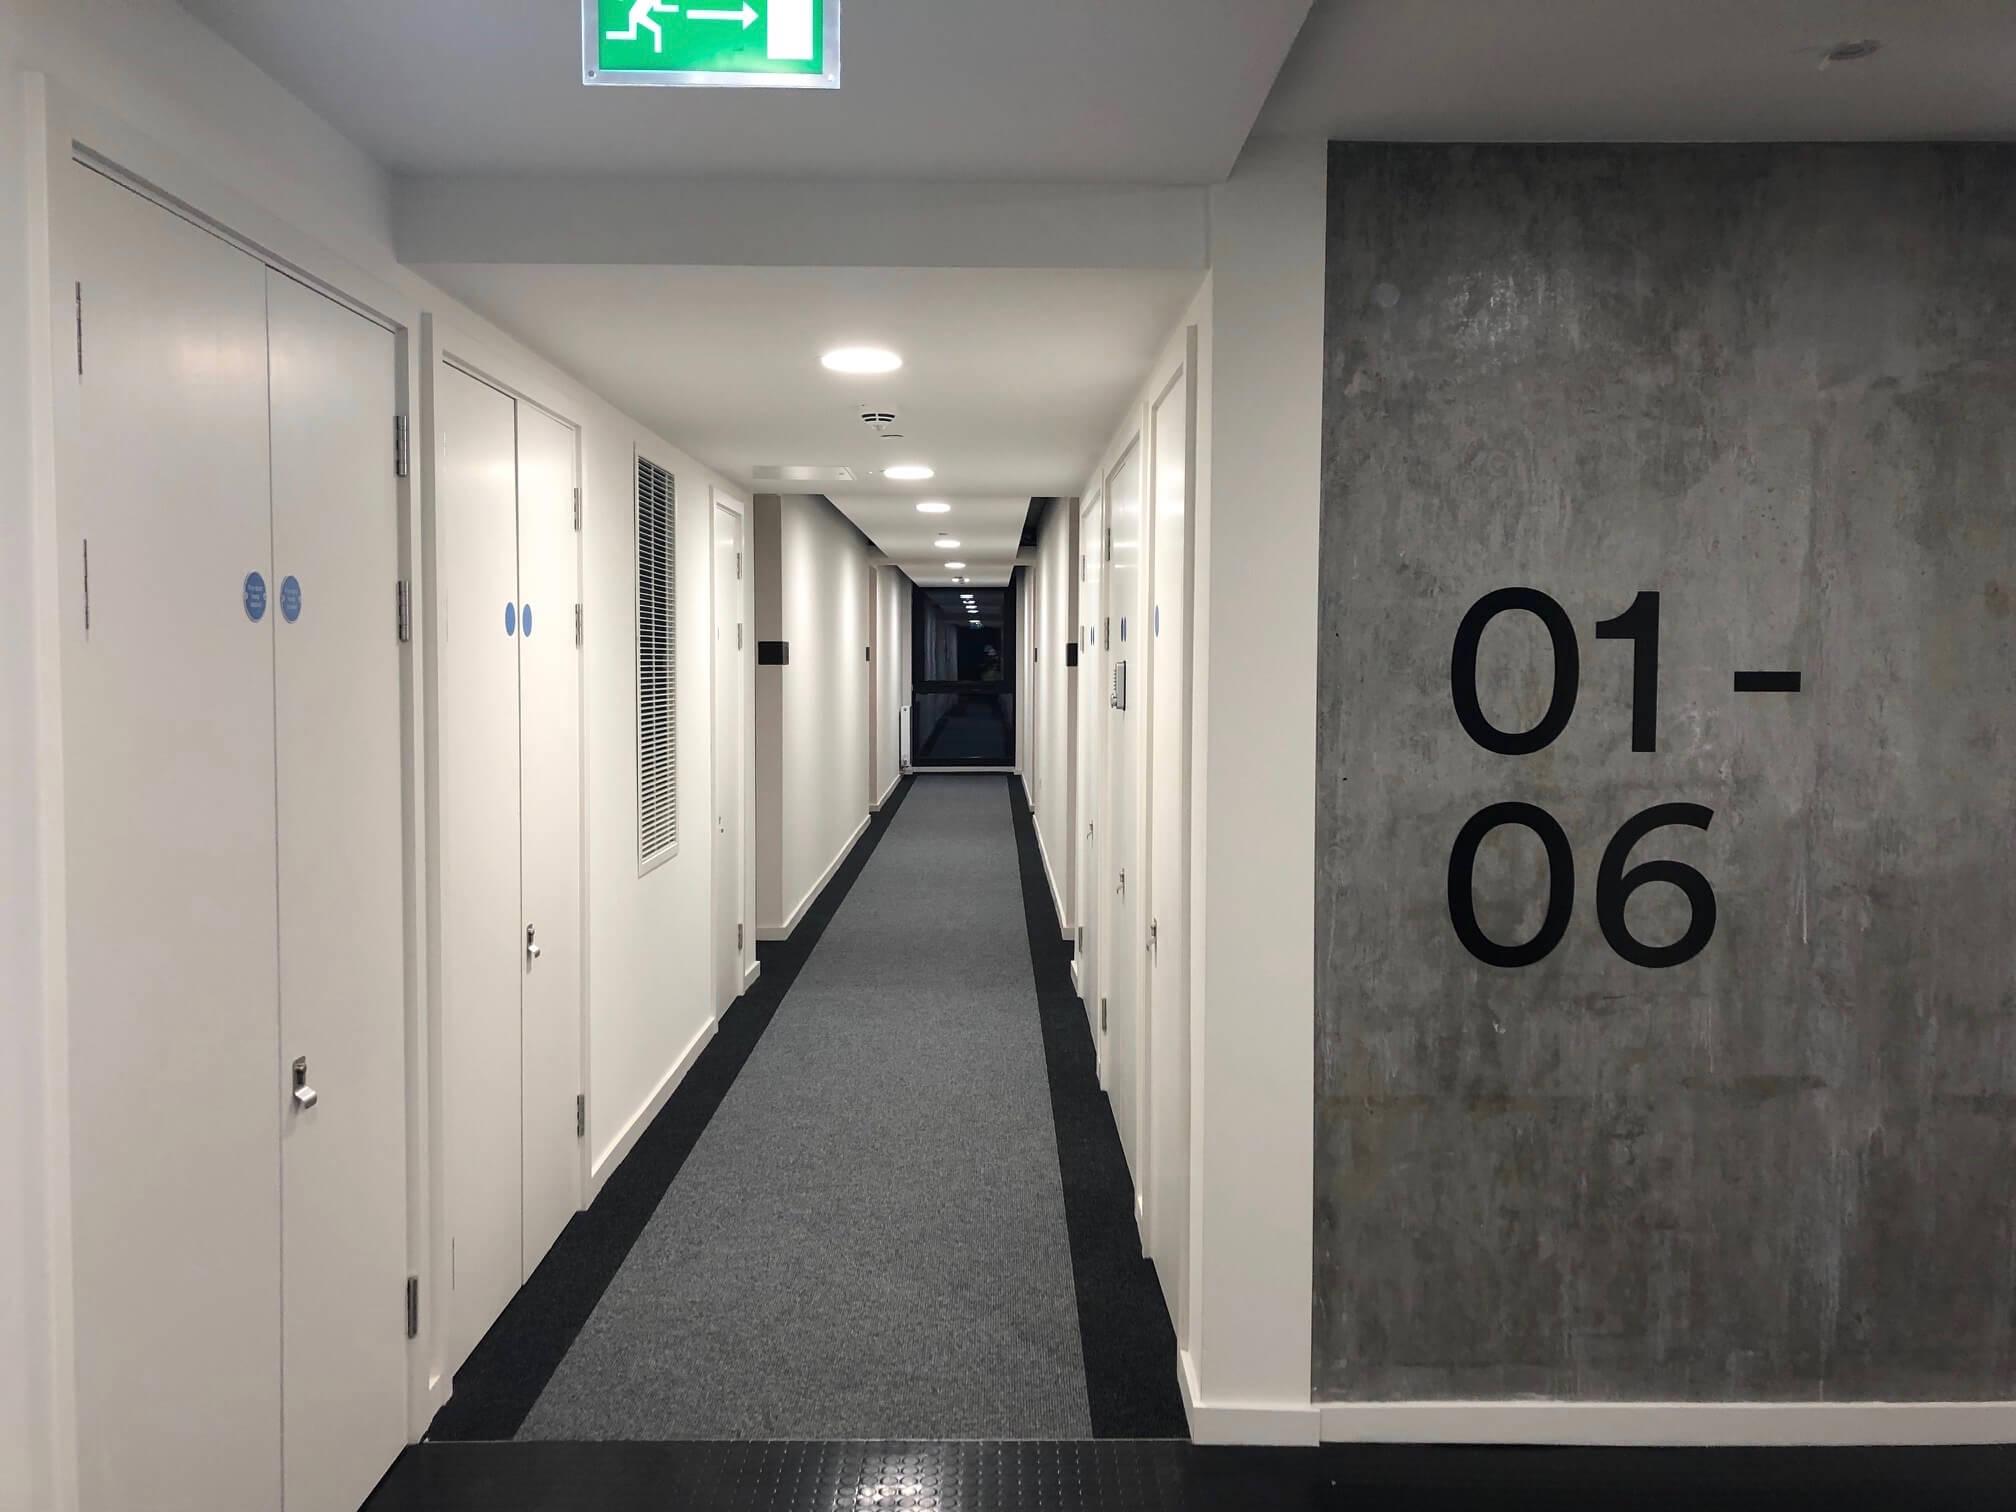 Corridor directional signage and wayfinding design